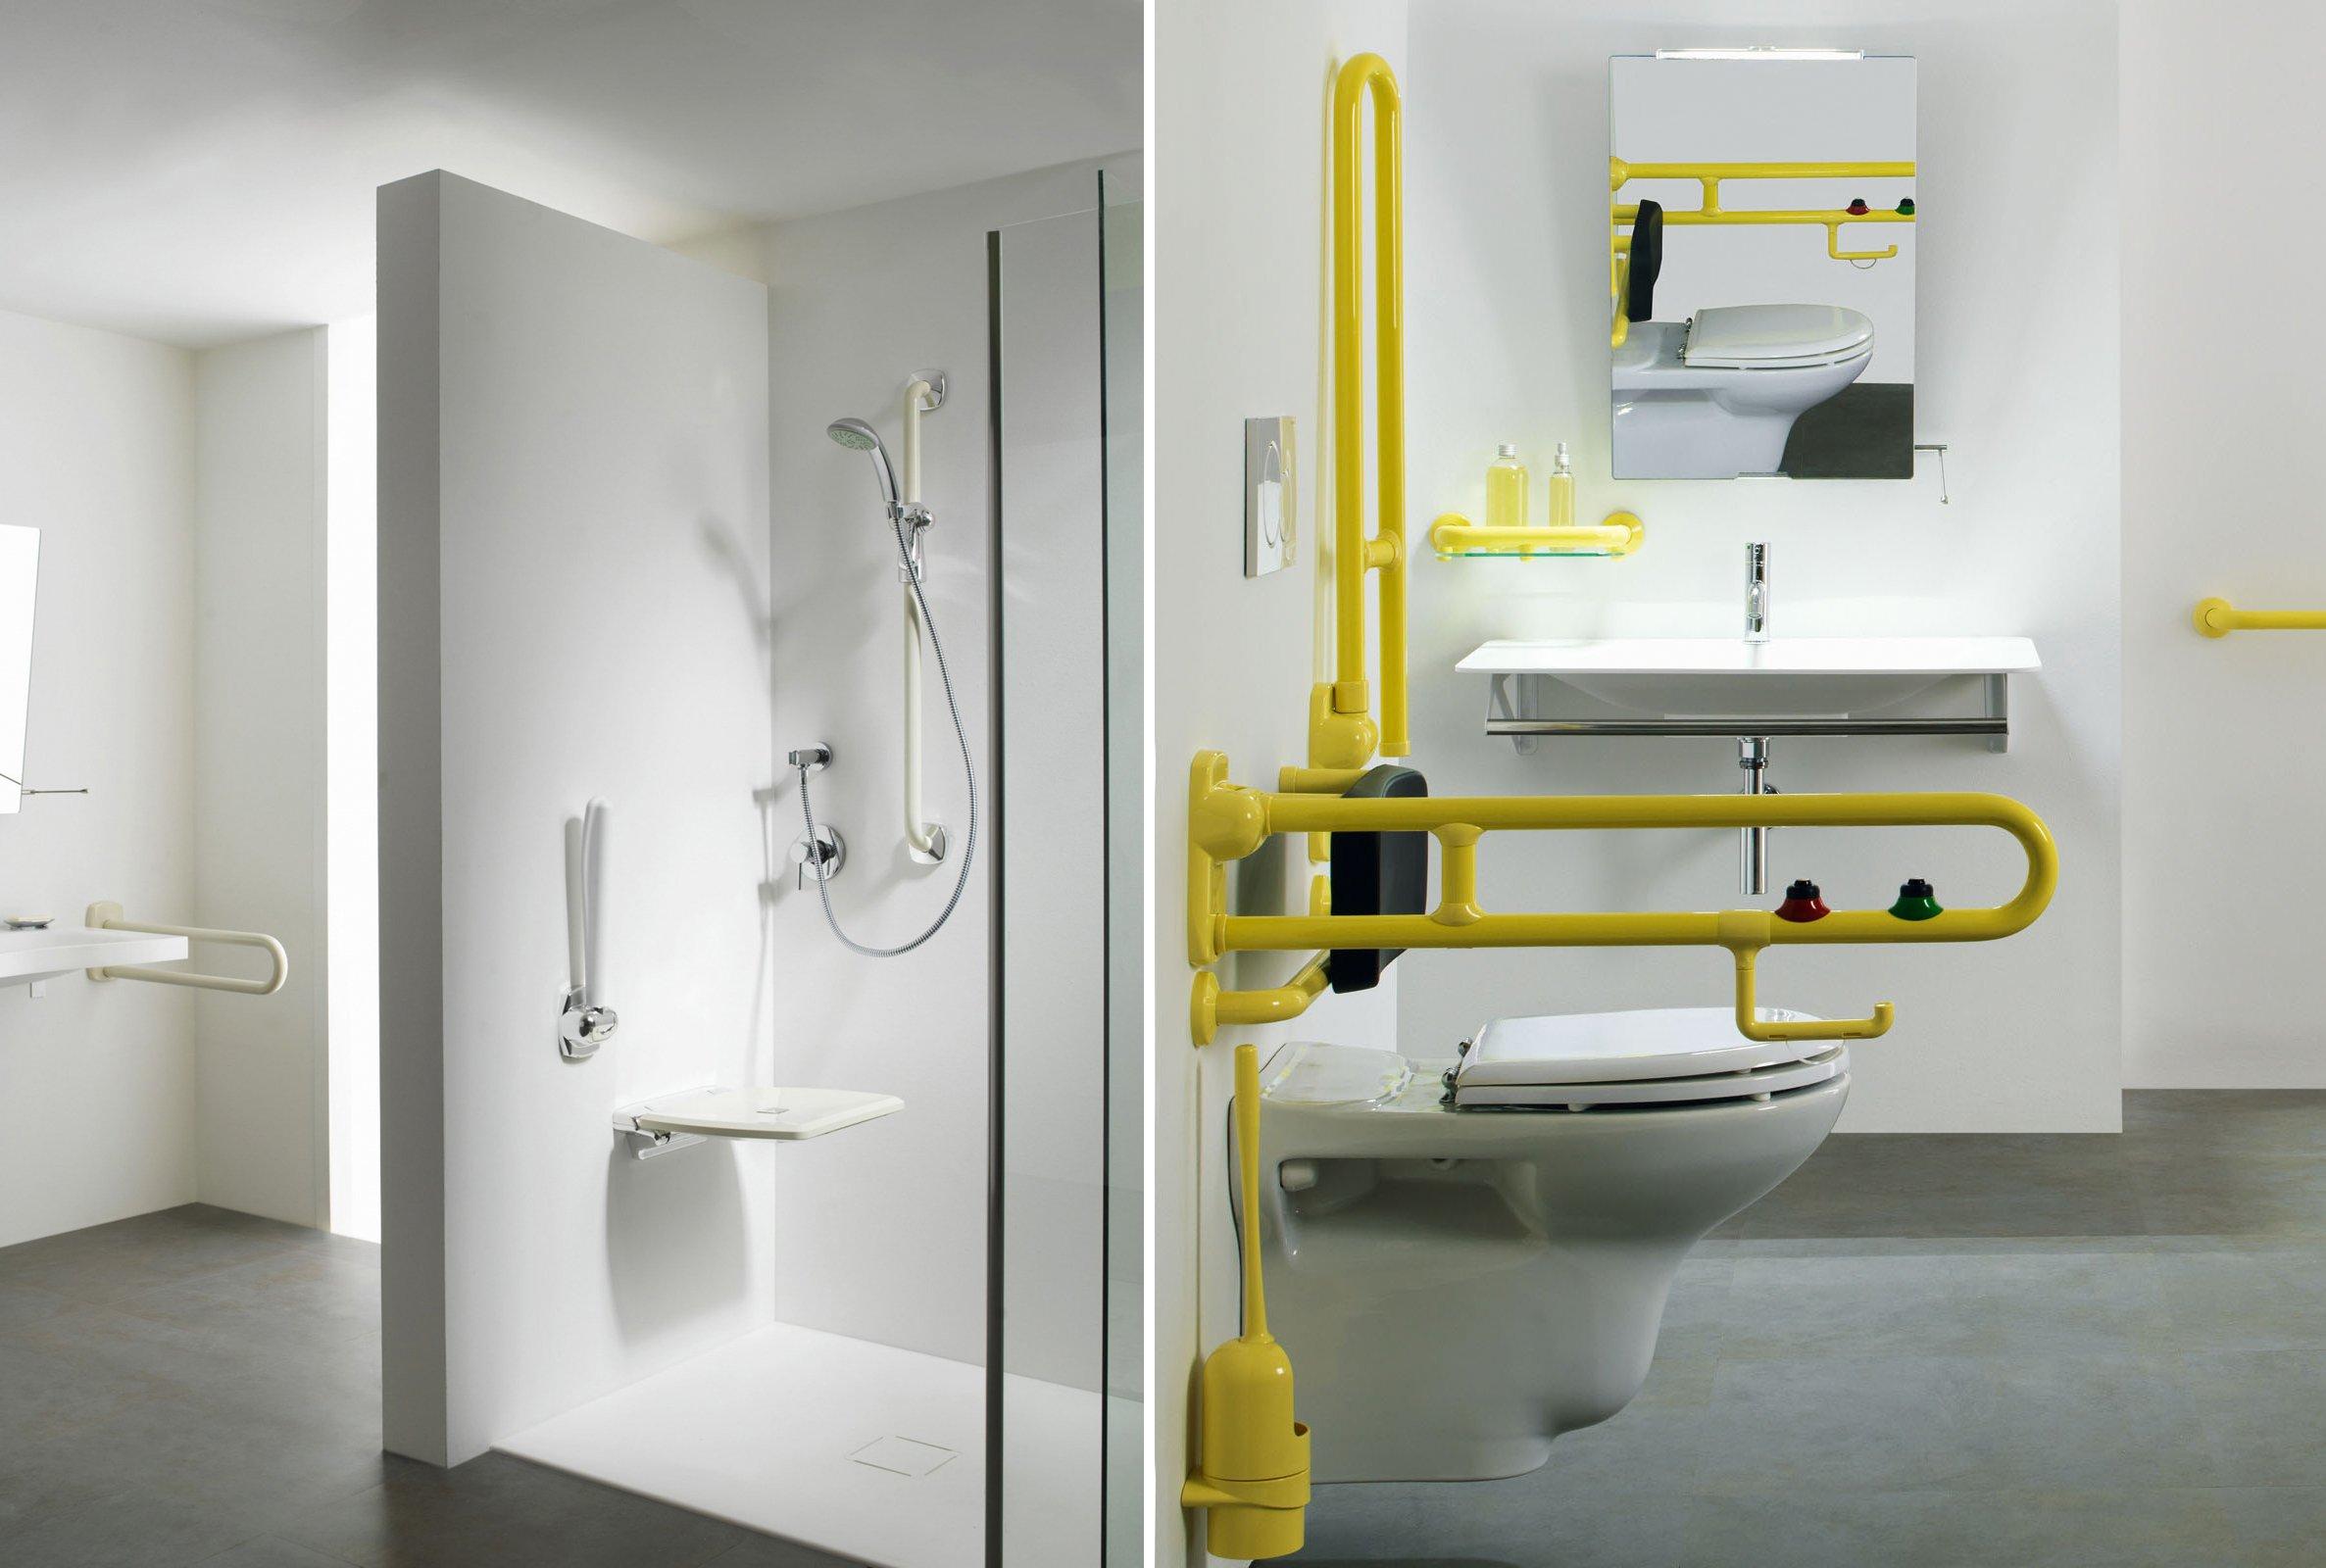 Sanitari praticit e sicurezza in pi cose di casa - Ponte giulio bagno disabili ...